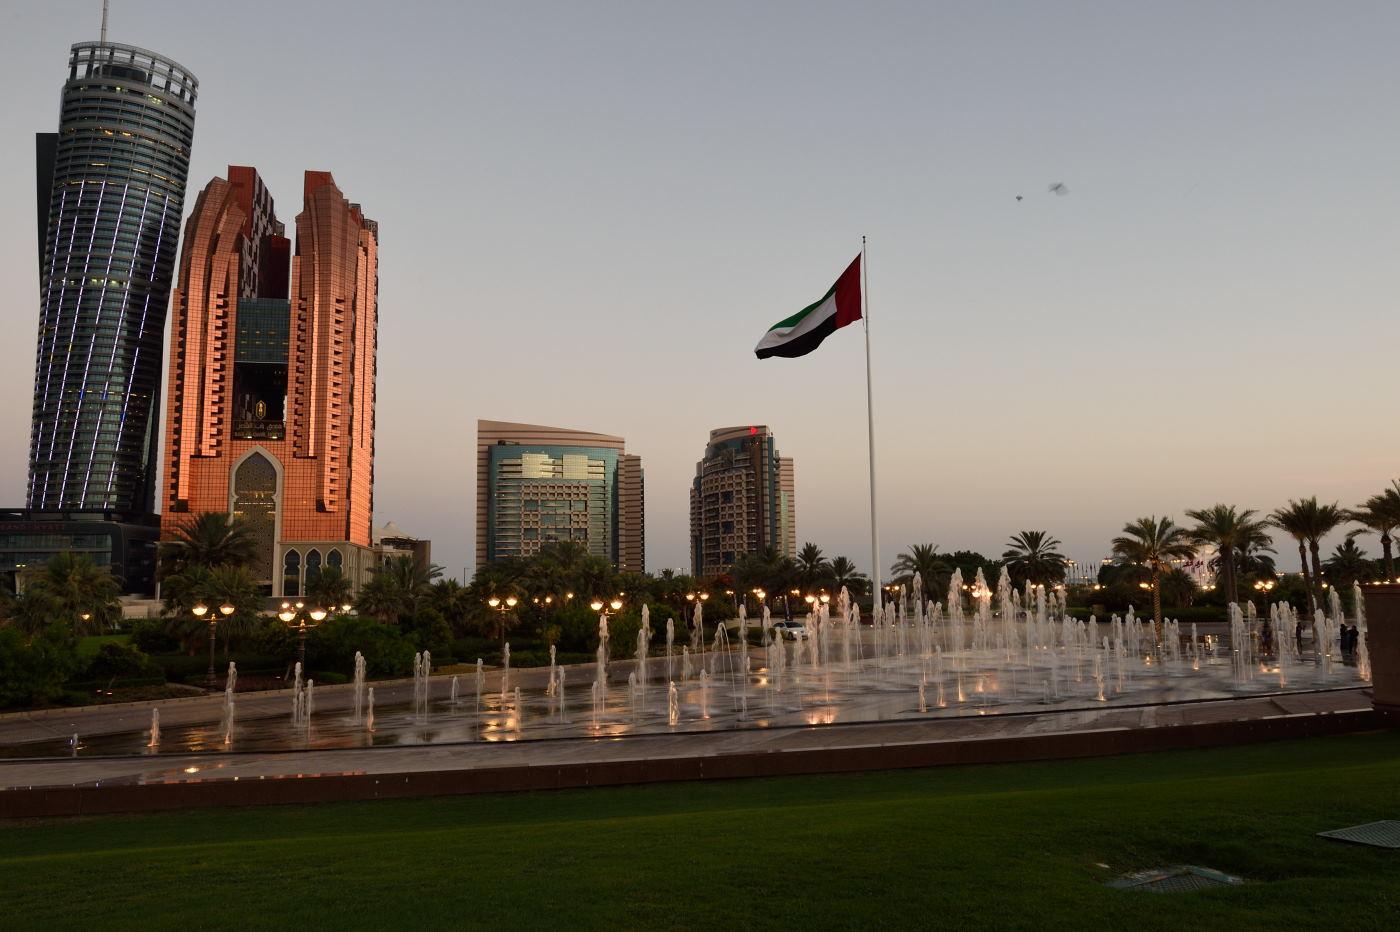 Фото 9. Отзыв об отеле EmiratesPalace Hotel в Абу-Даби. Путешествие в сказочное королевство. 1/25, f/11.0, 1000, 24. Камера Nikon D4s + объектив Nikon 24-70mm f/2.8G.